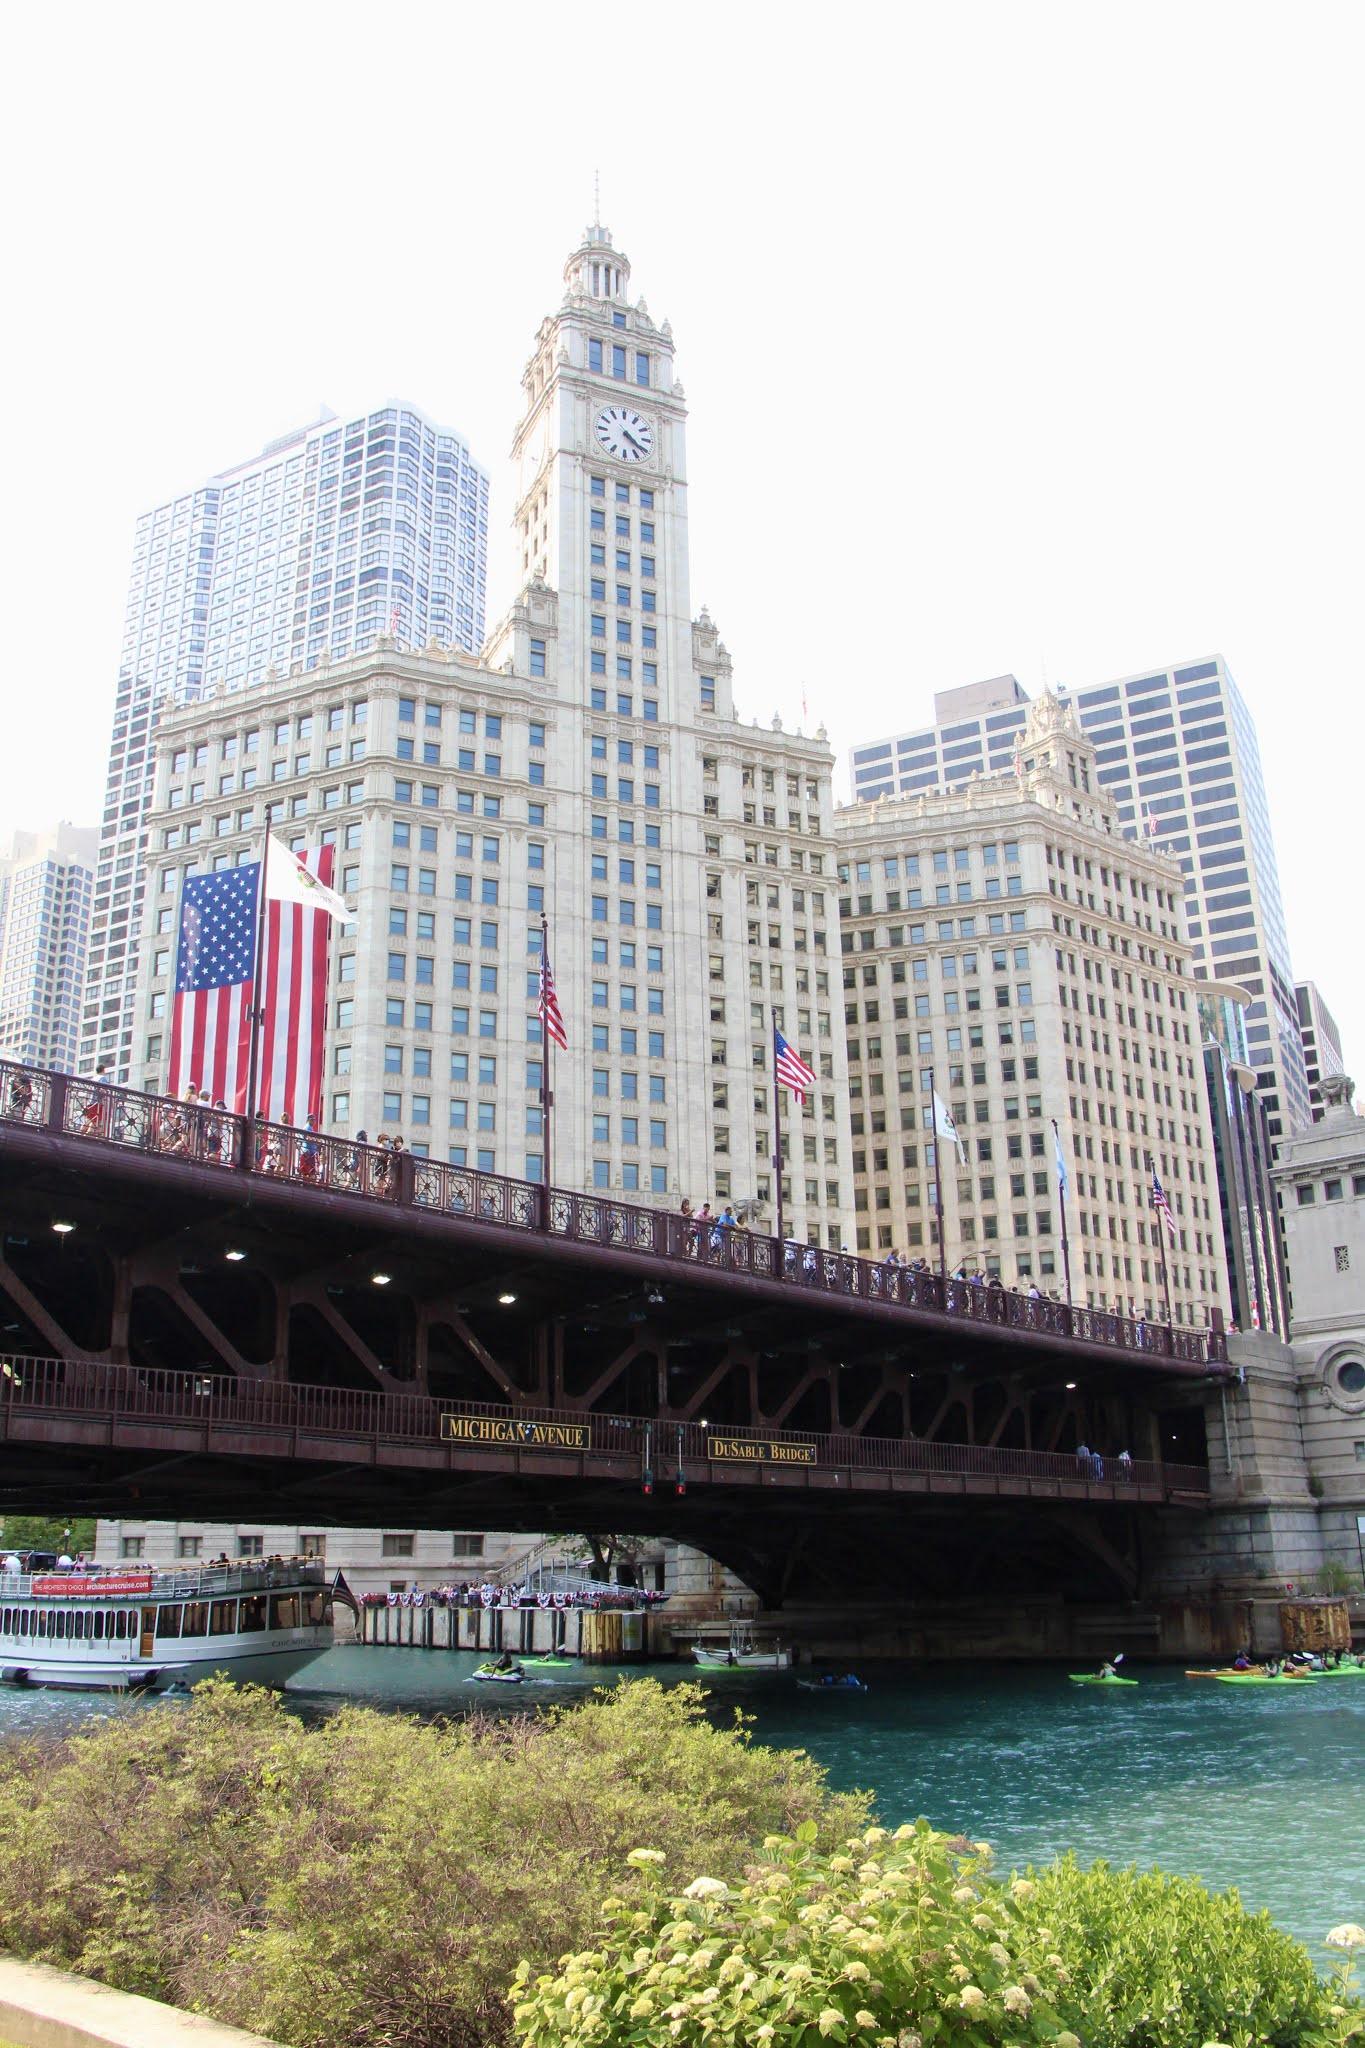 river, chicago, lake michigan, travel guide, explore chicago